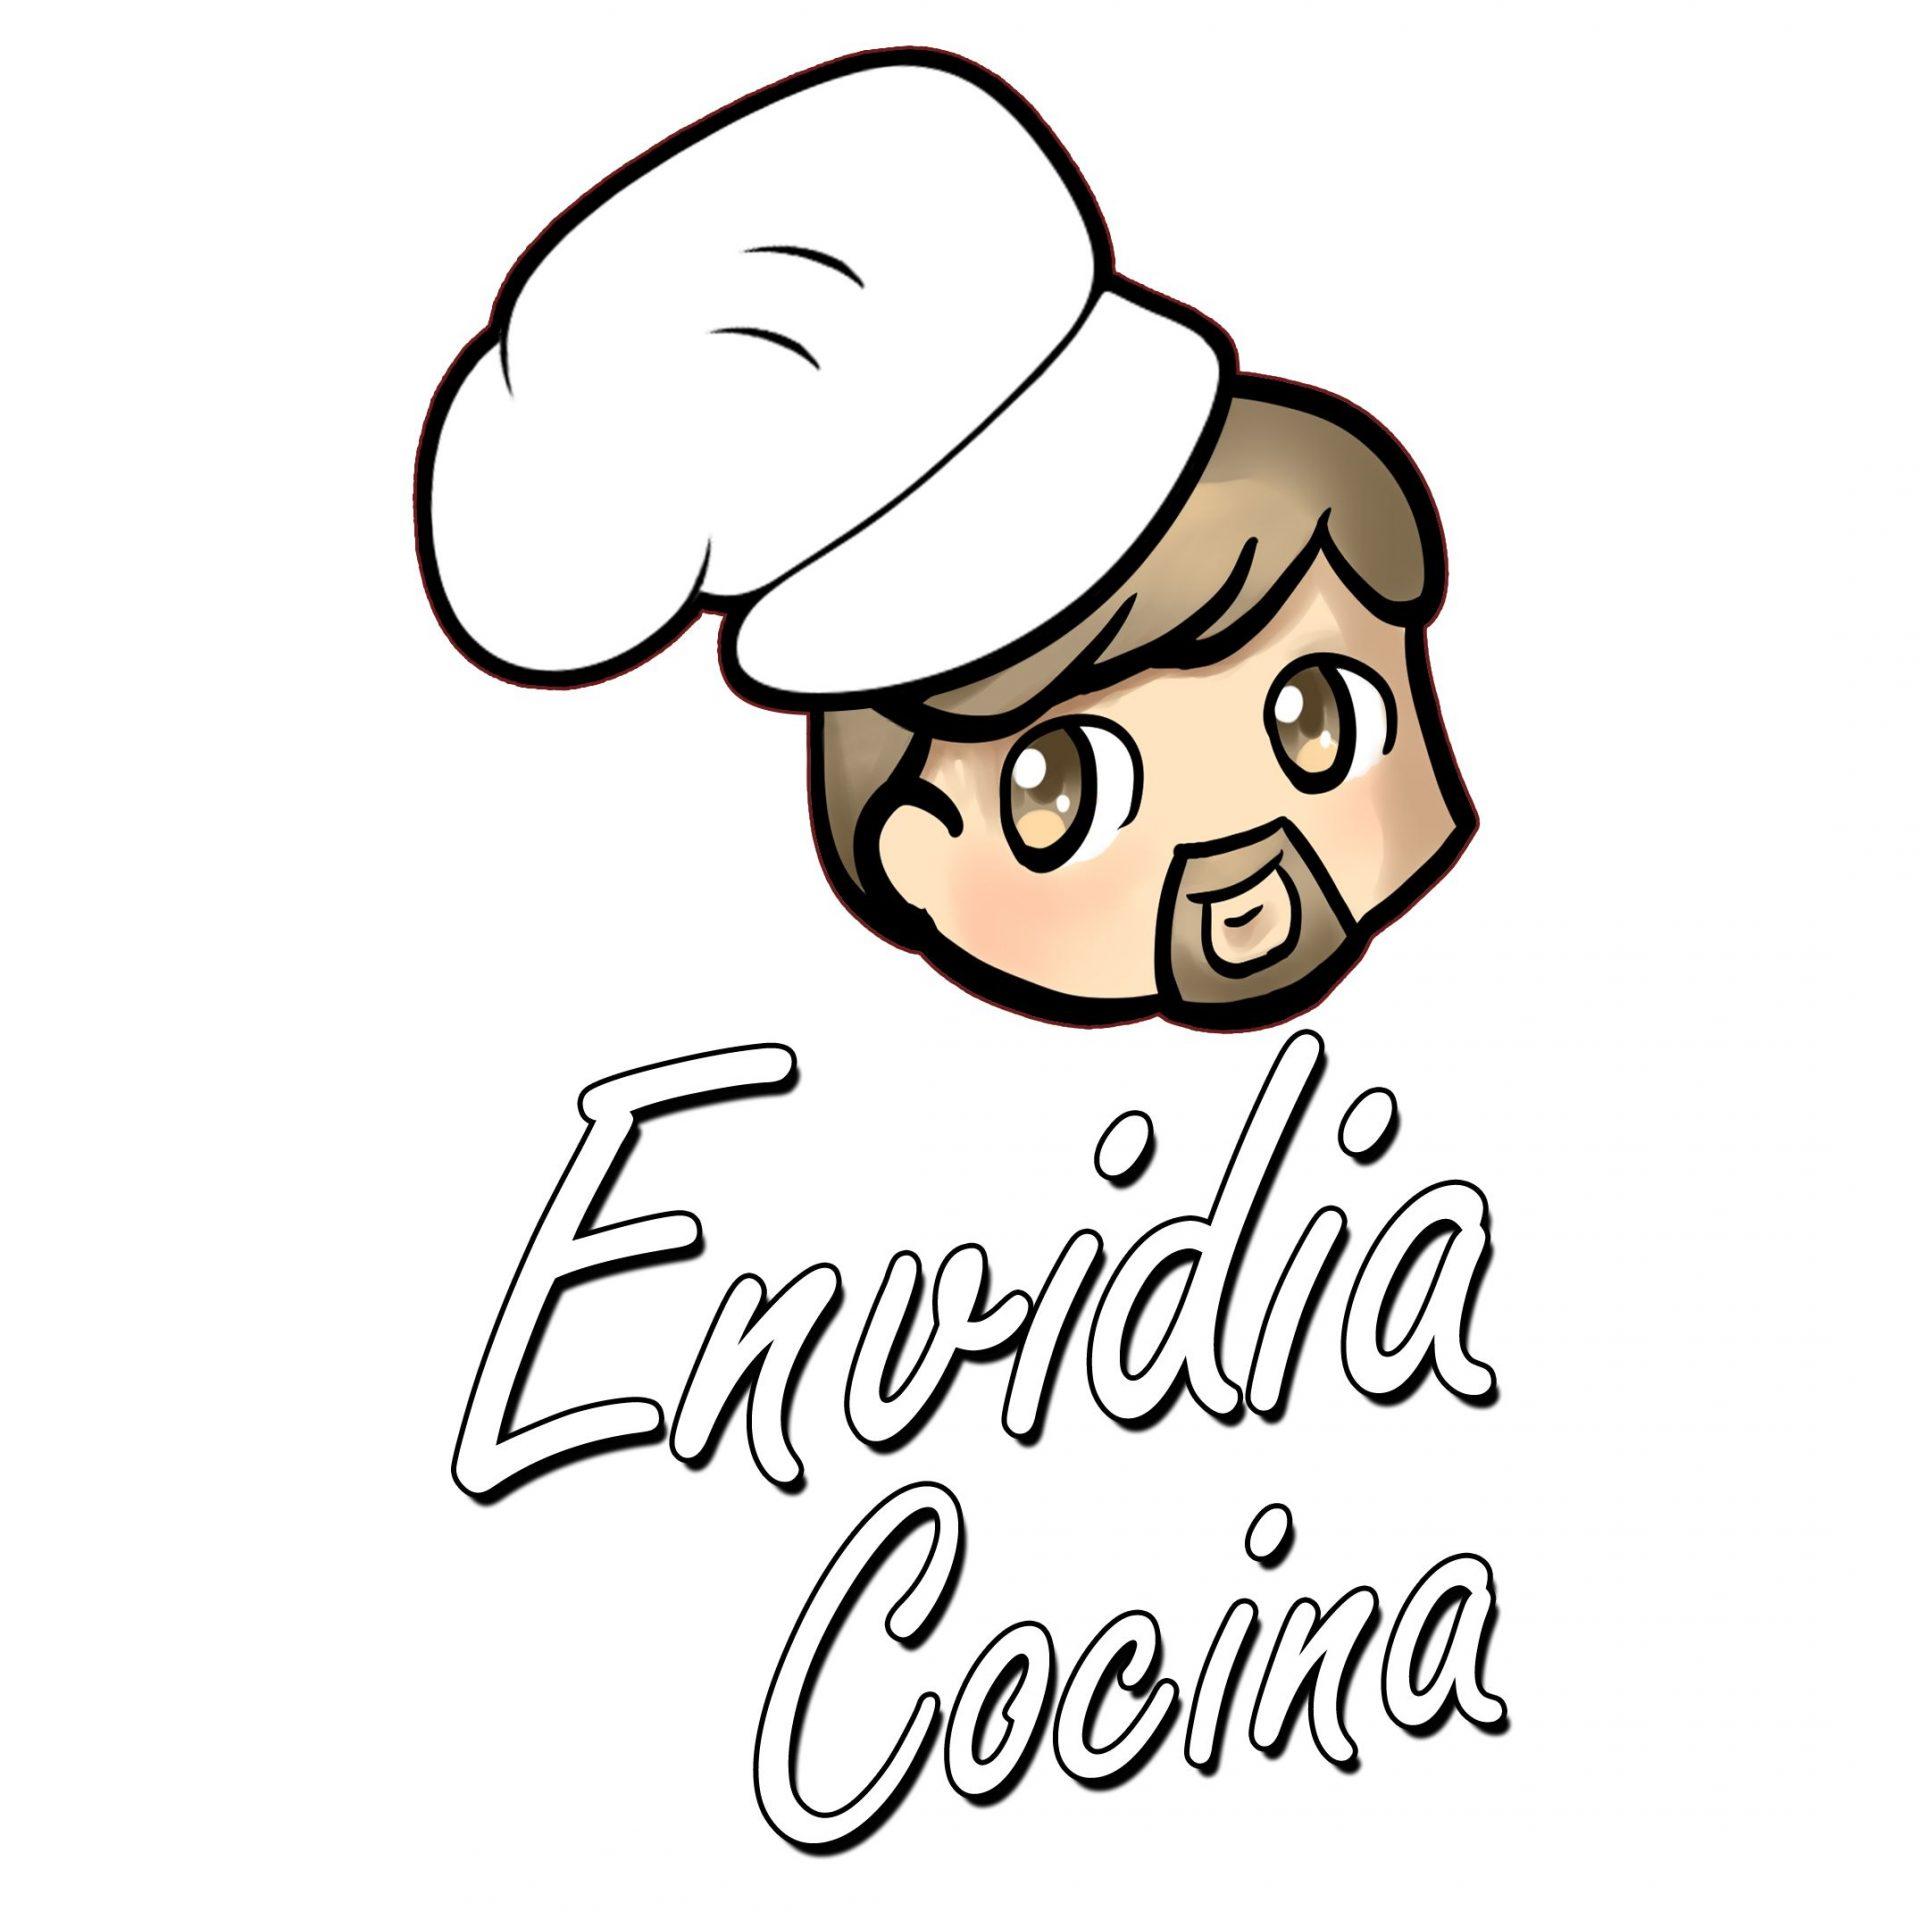 Angelo Envidia Cocina